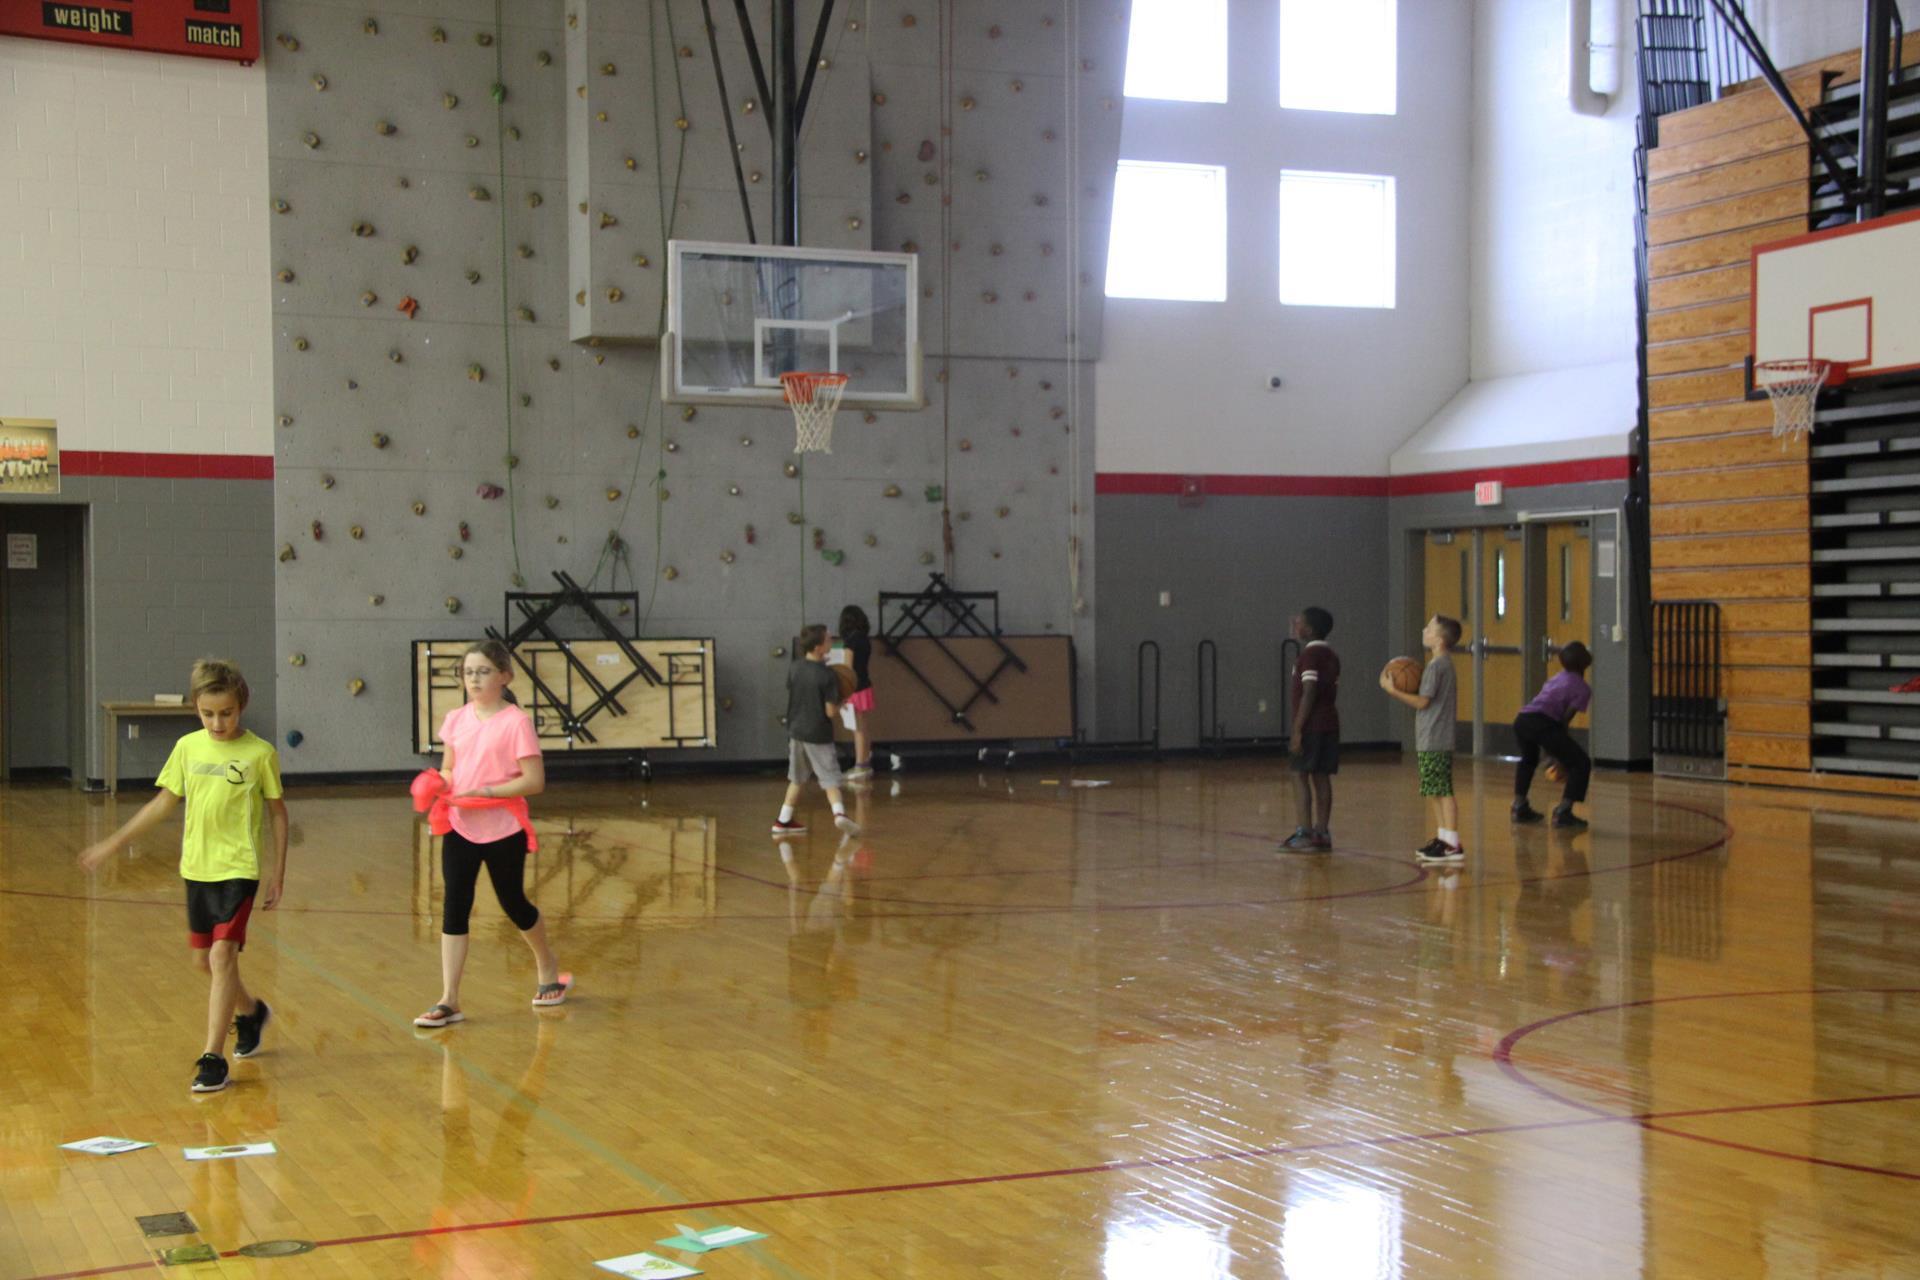 wide shot of gymnasium